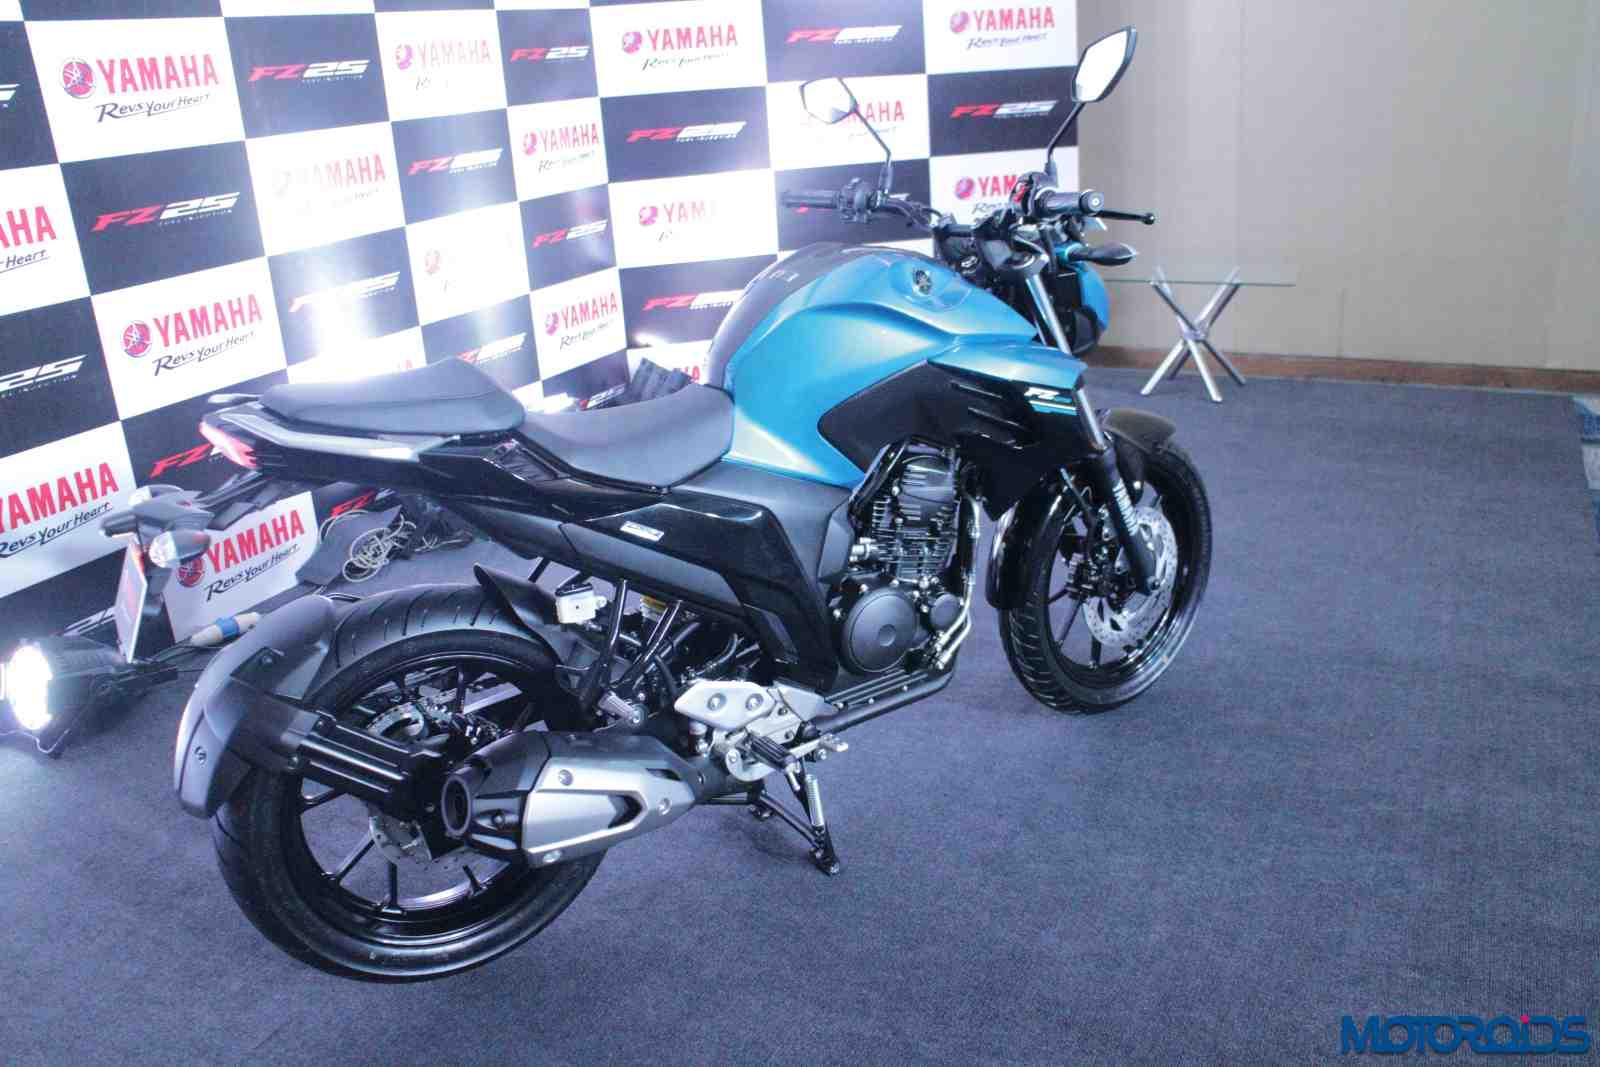 Yamaha-FZ25-India-Launch-46